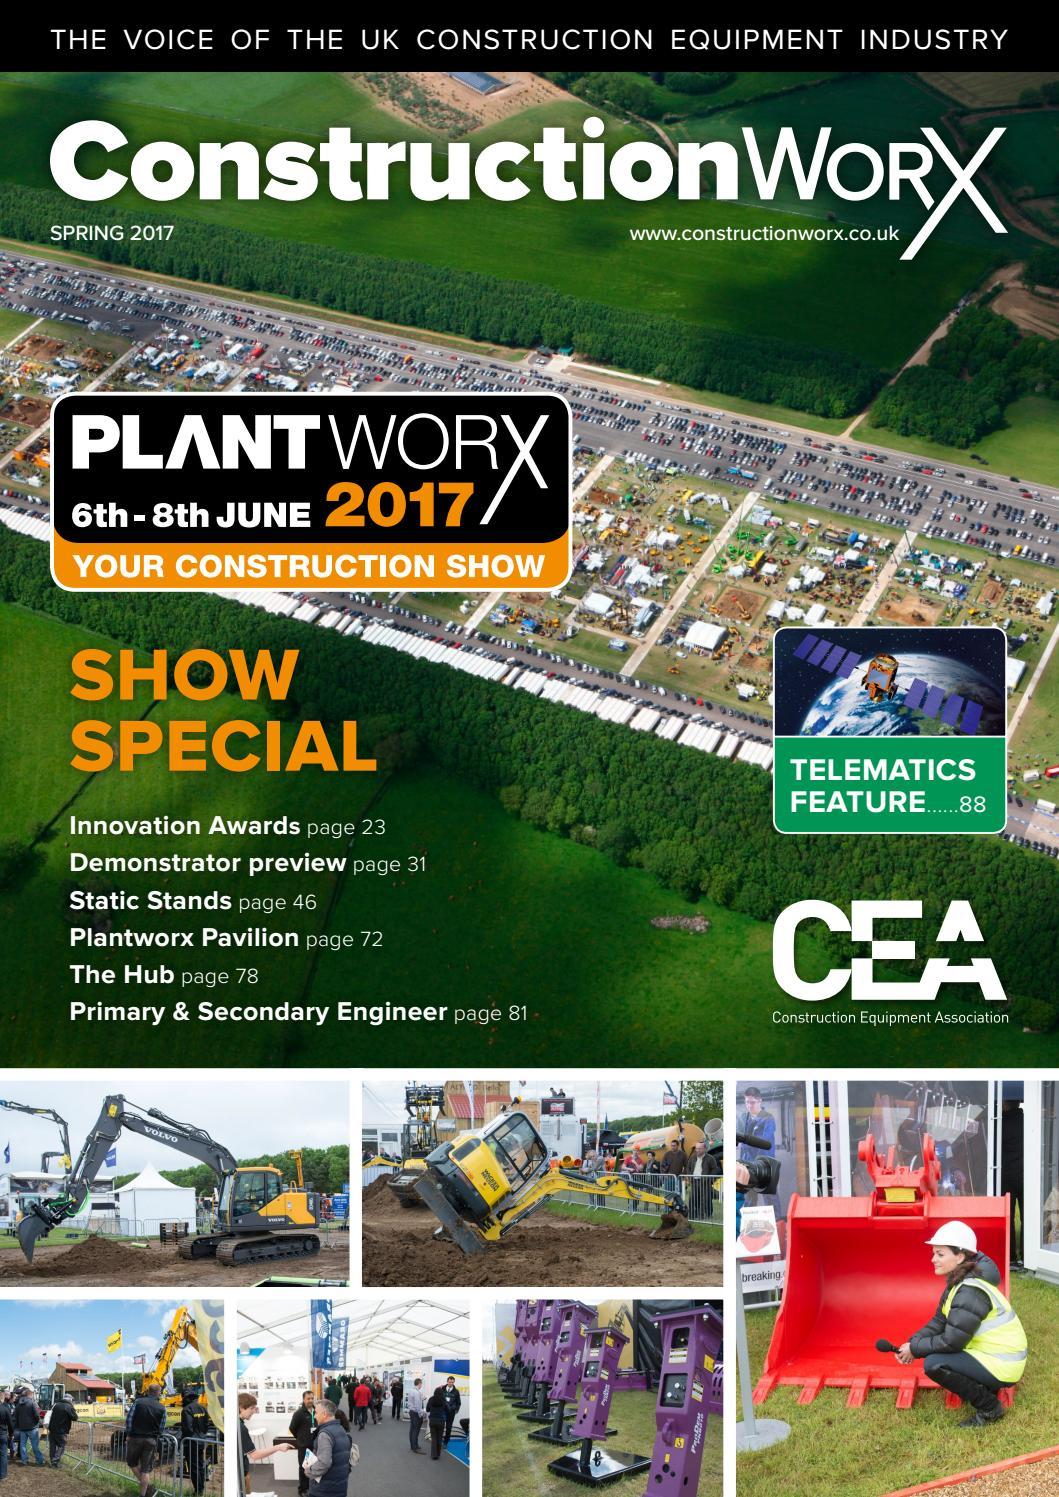 ConstructionWorX - Spring 2017 - PLANTWORX Issue by